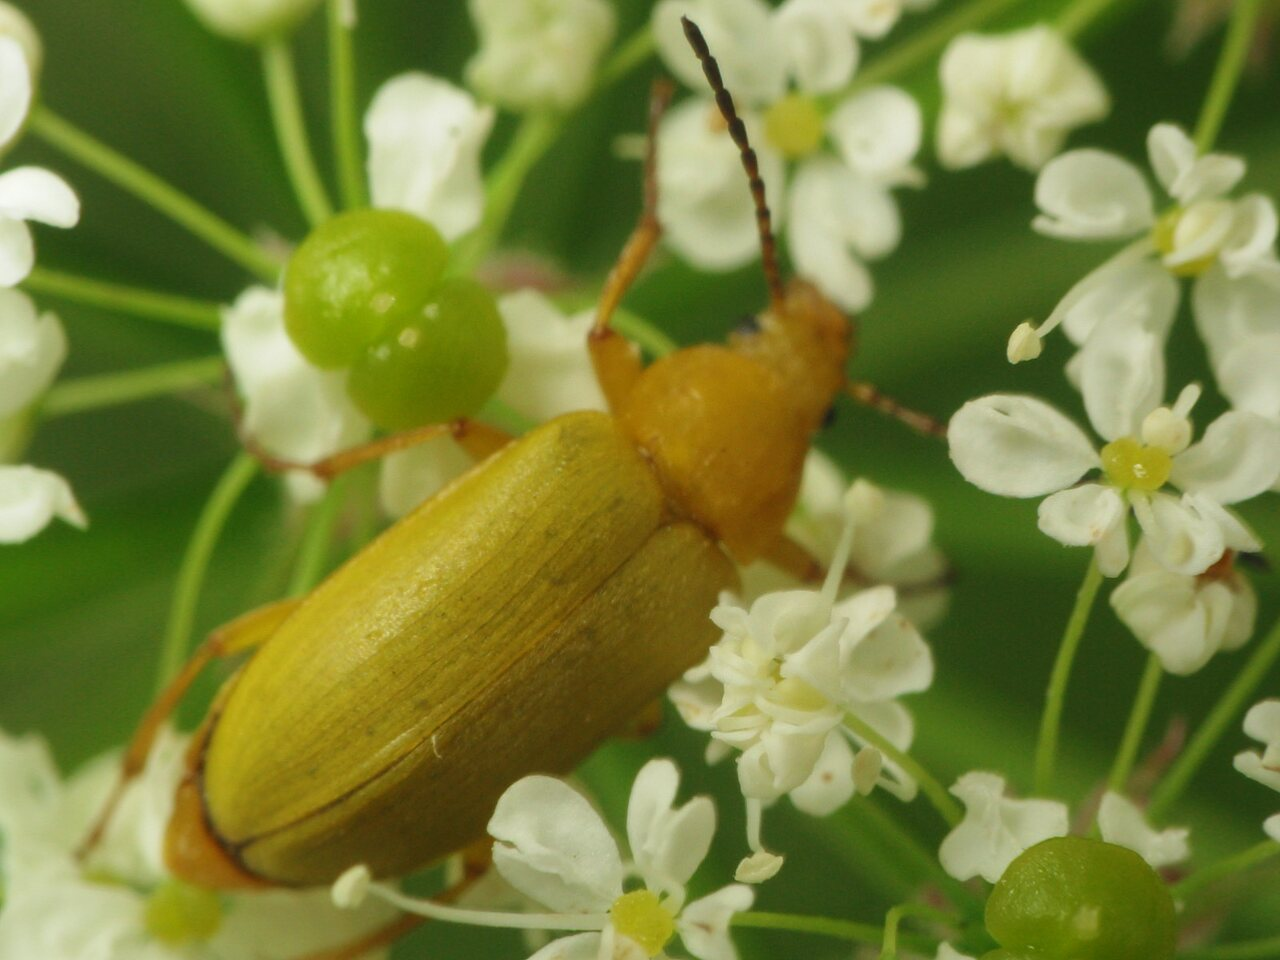 Cteniopus-flavus-3631.jpg